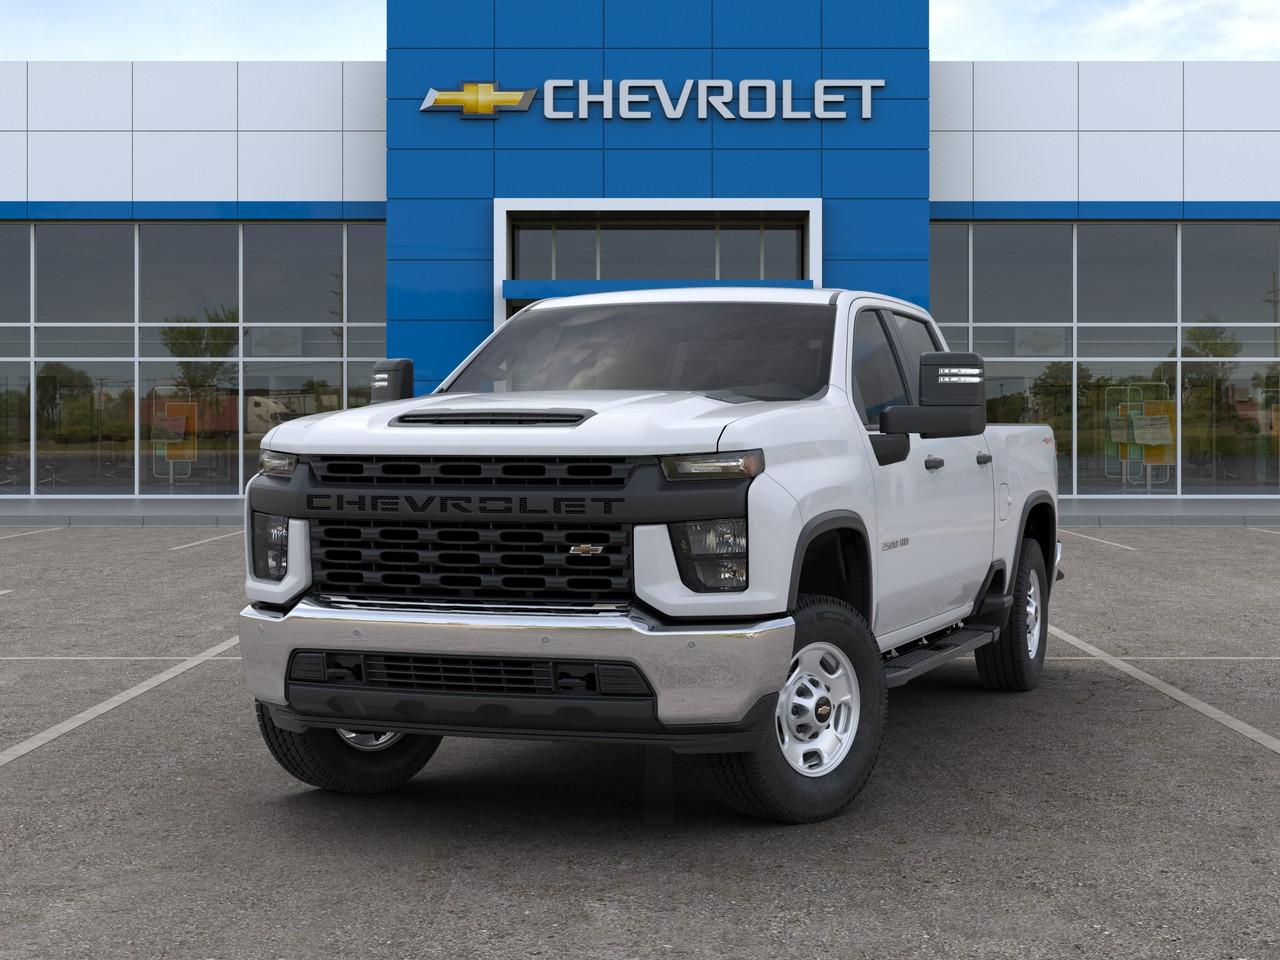 2020 Chevrolet Silverado 2500HD Work Truck Crew Cab Pickup